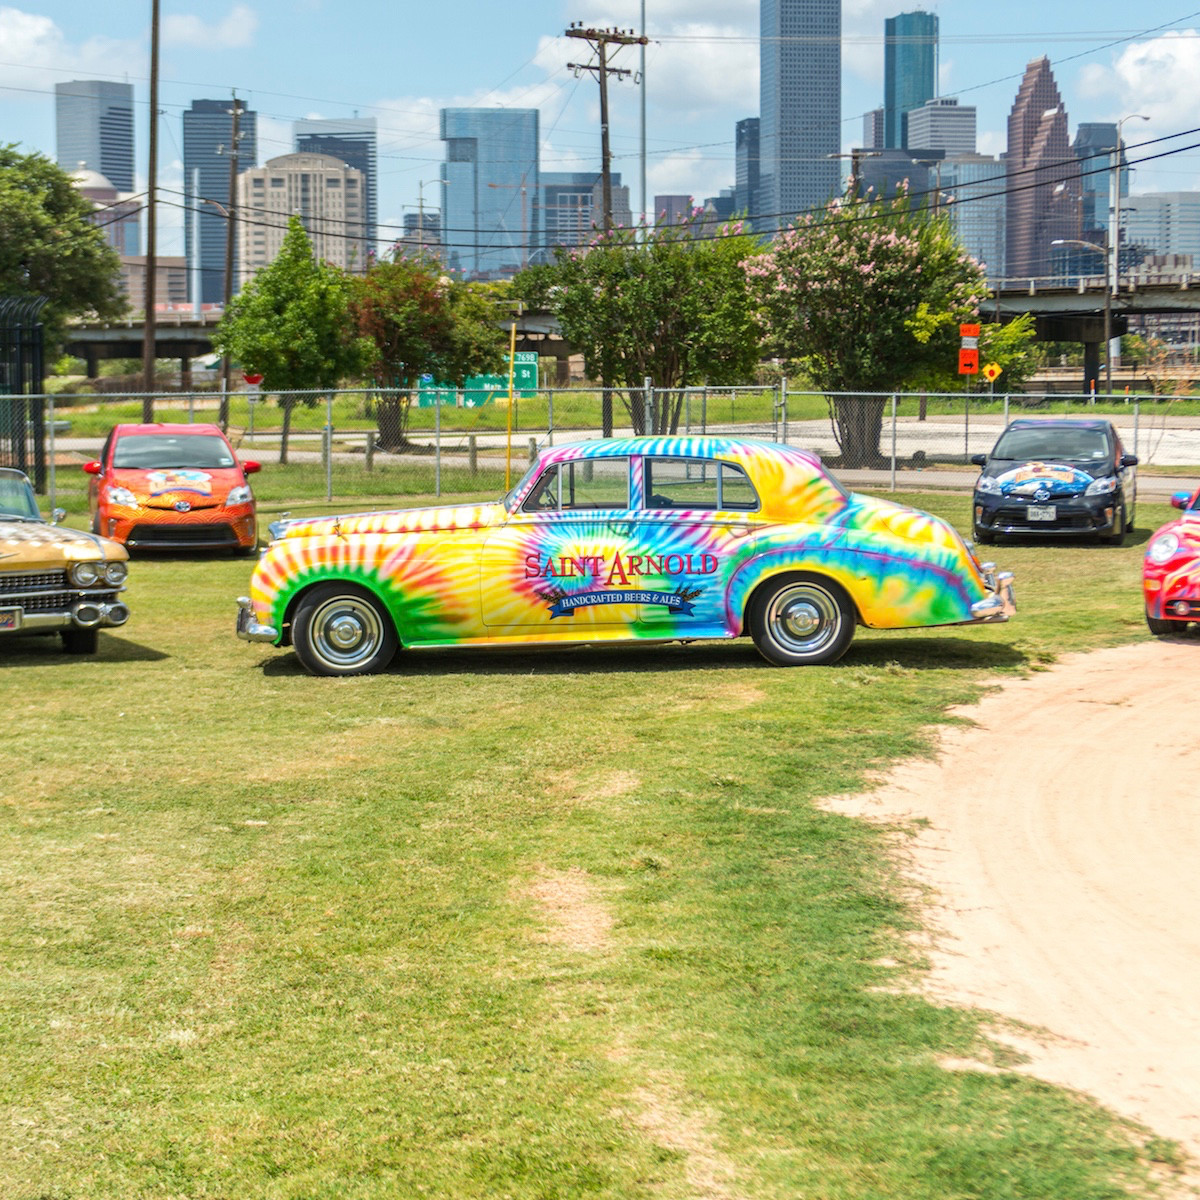 Saint Arnold Art Car IPA